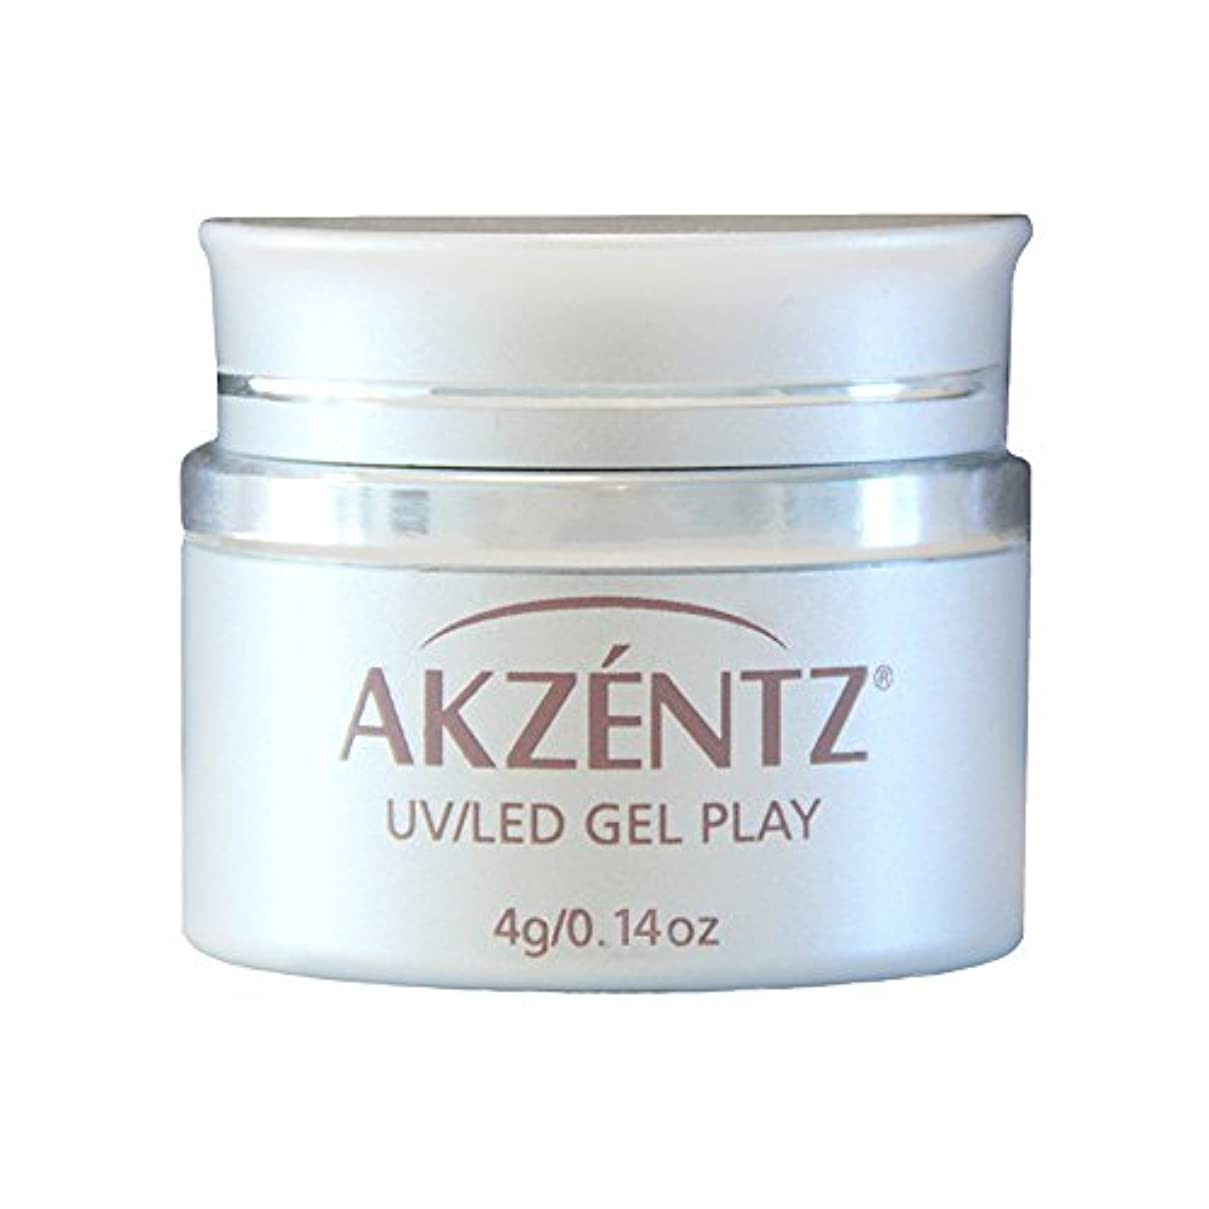 AKZENTZ カラージェル ジェルプレイ グリッツ ローズゴールドリーフ 4g UV/LED対応